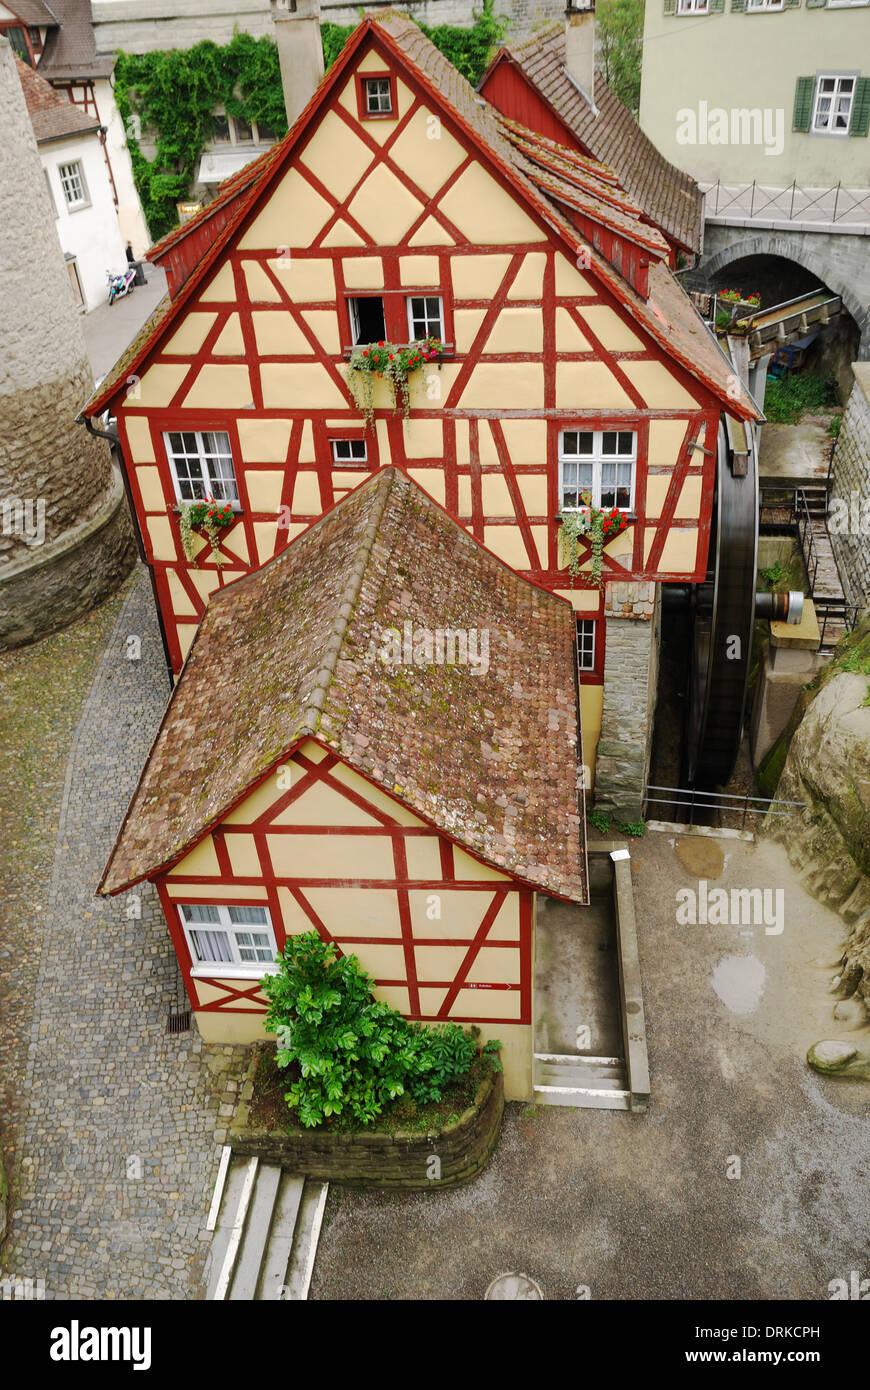 Fachwerk house in the European town - Stock Image